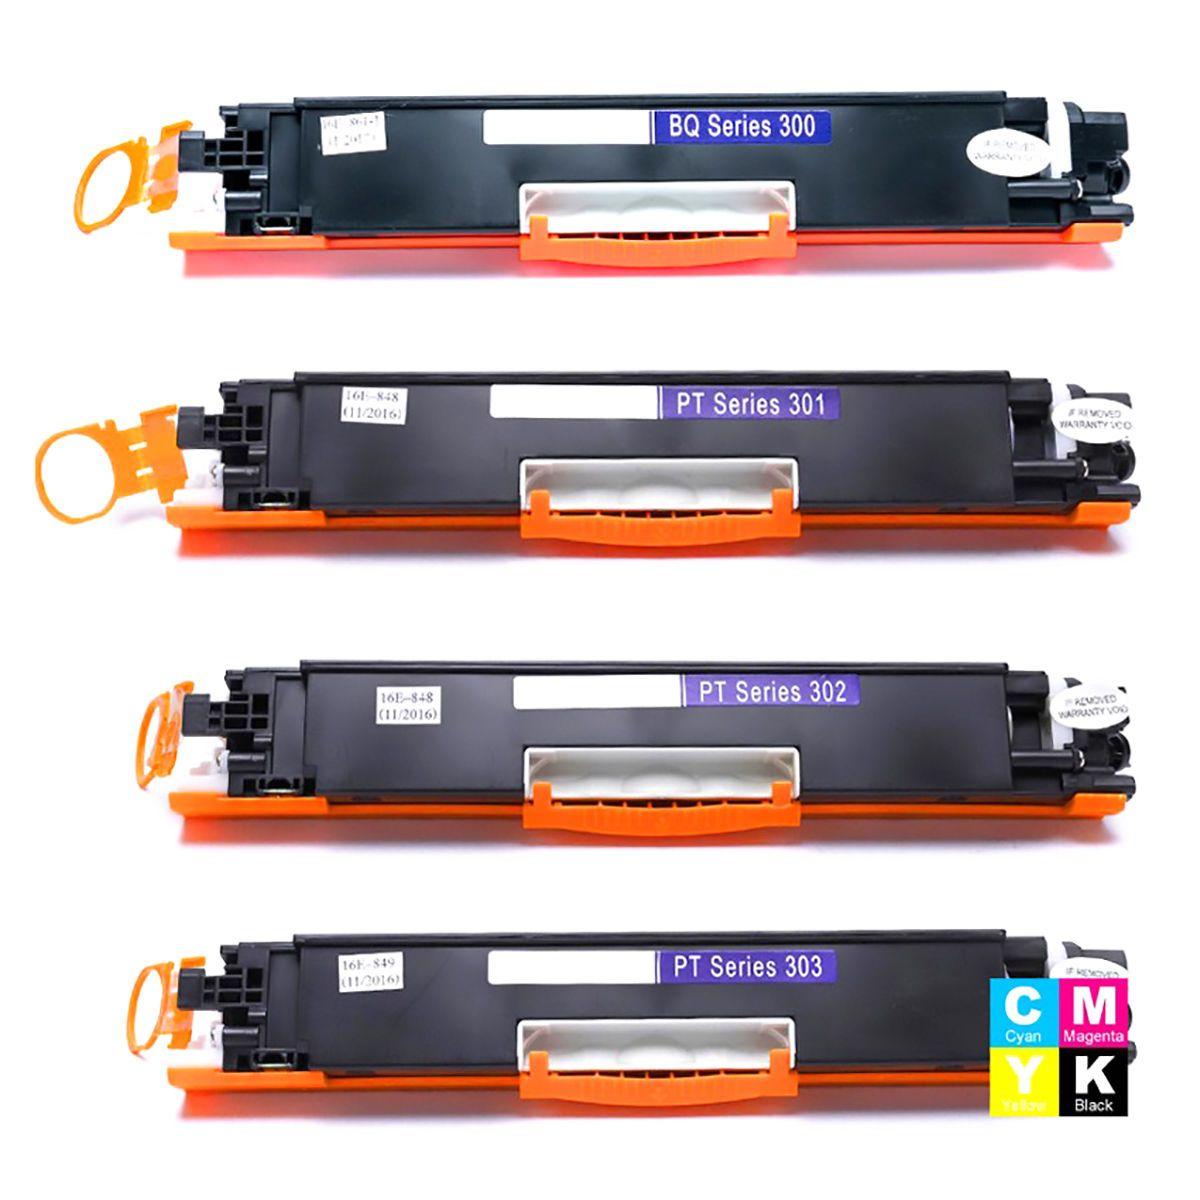 Kit Colorido De Toner Compatvel Para Hp M175a M175nw Mundoware Tinta 126a Cmyk Laserjet Color 4 Cores 130a Impressora 100 M175